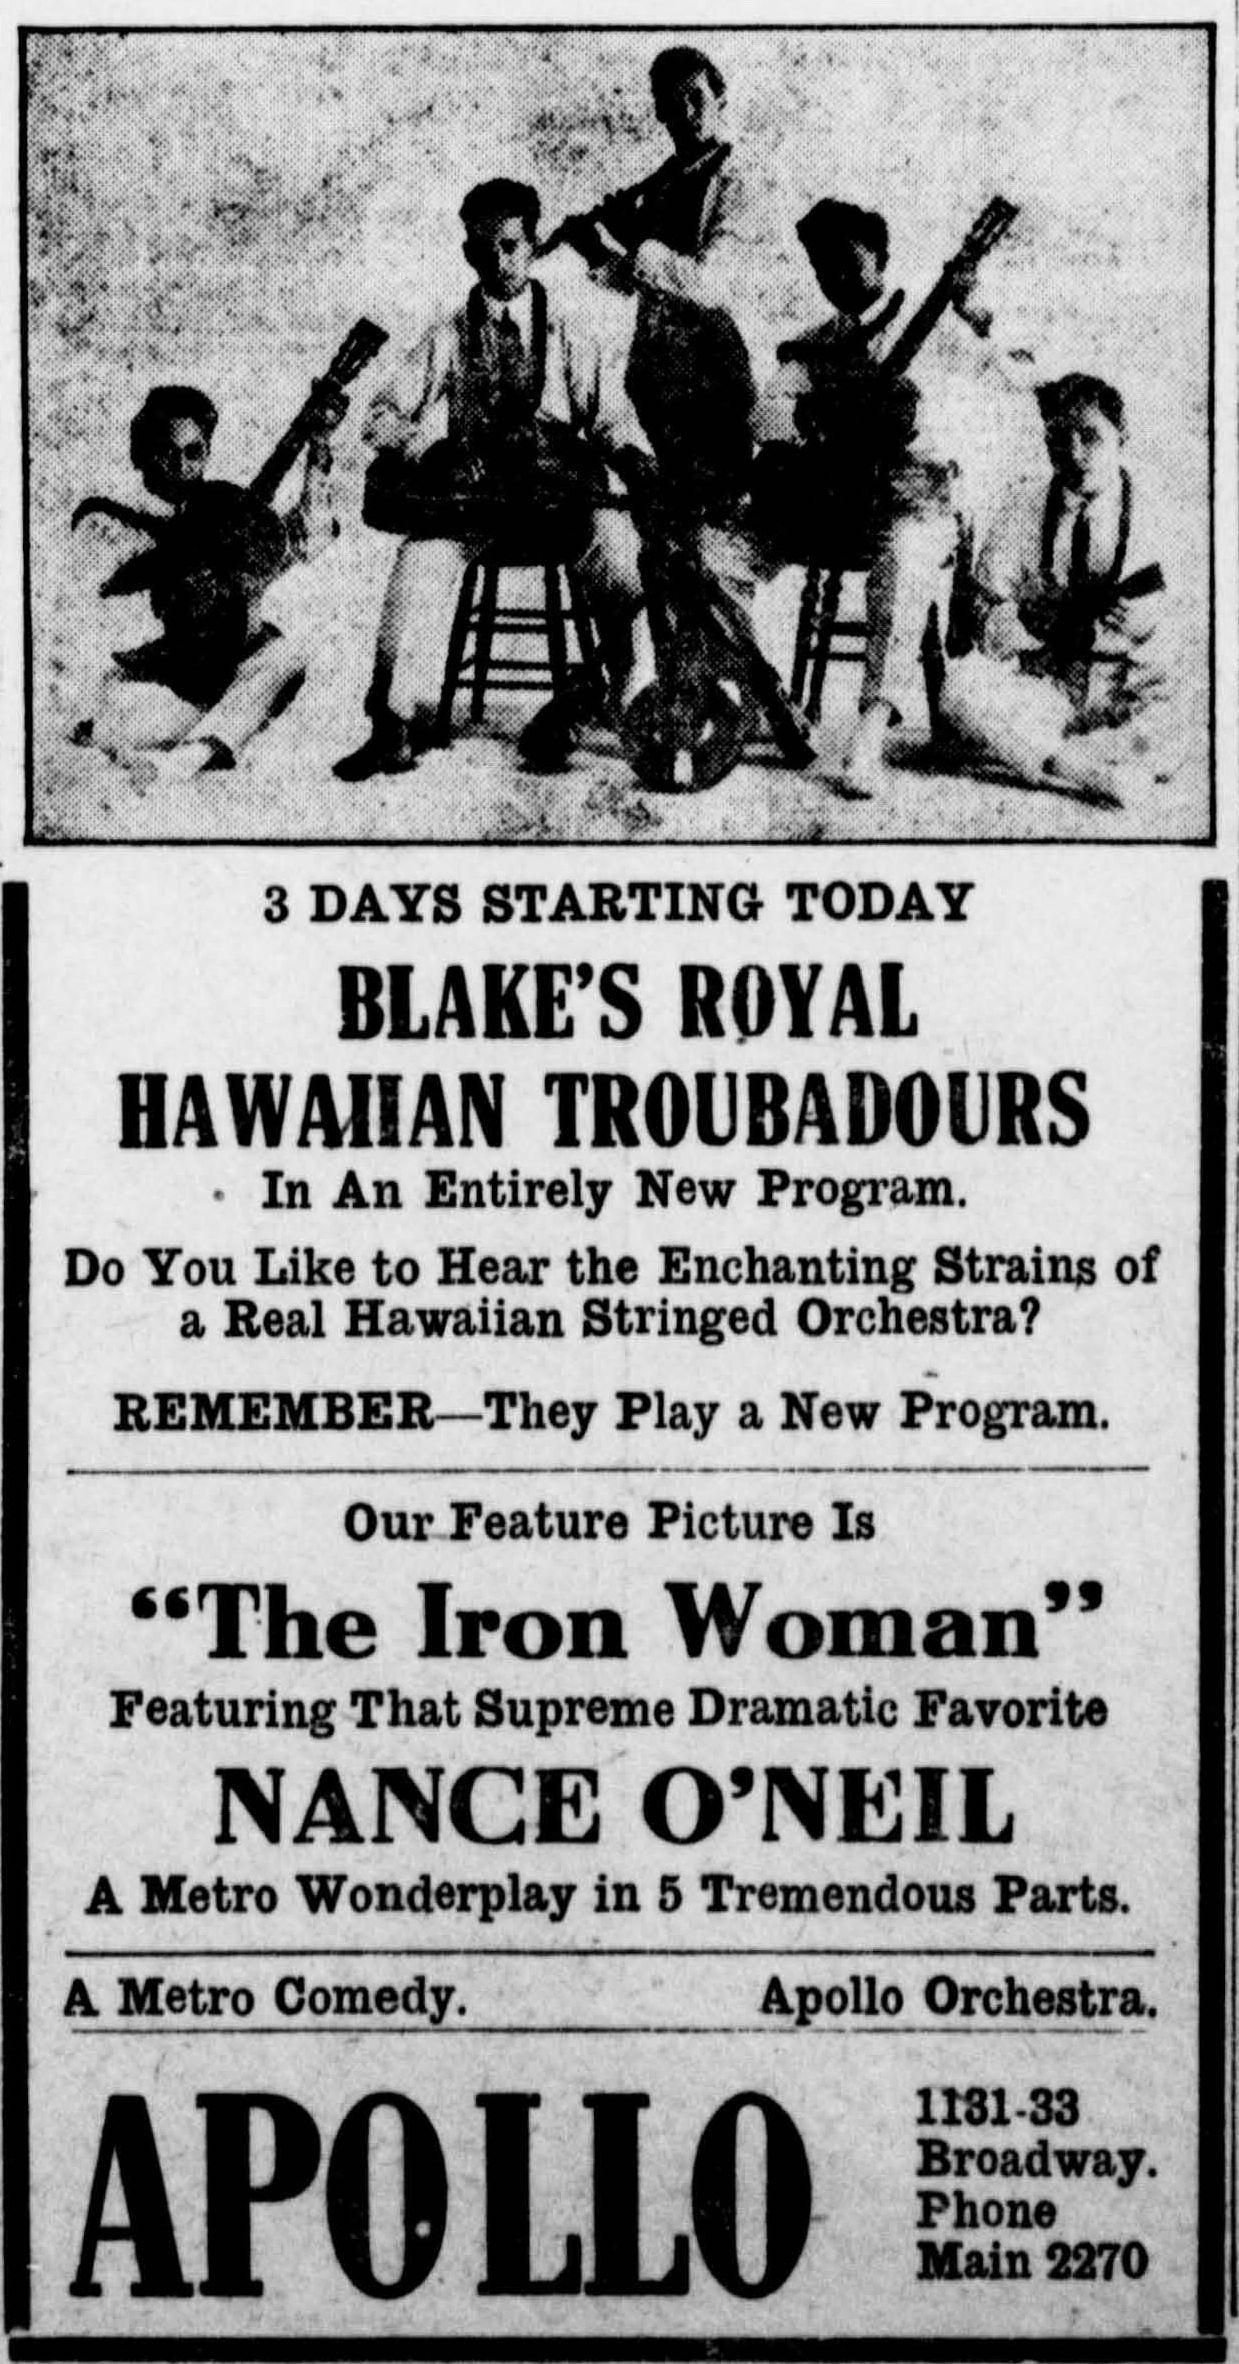 Hawaiian Musicians on the U S  Mainland in the Early 1900s - Hawai'i